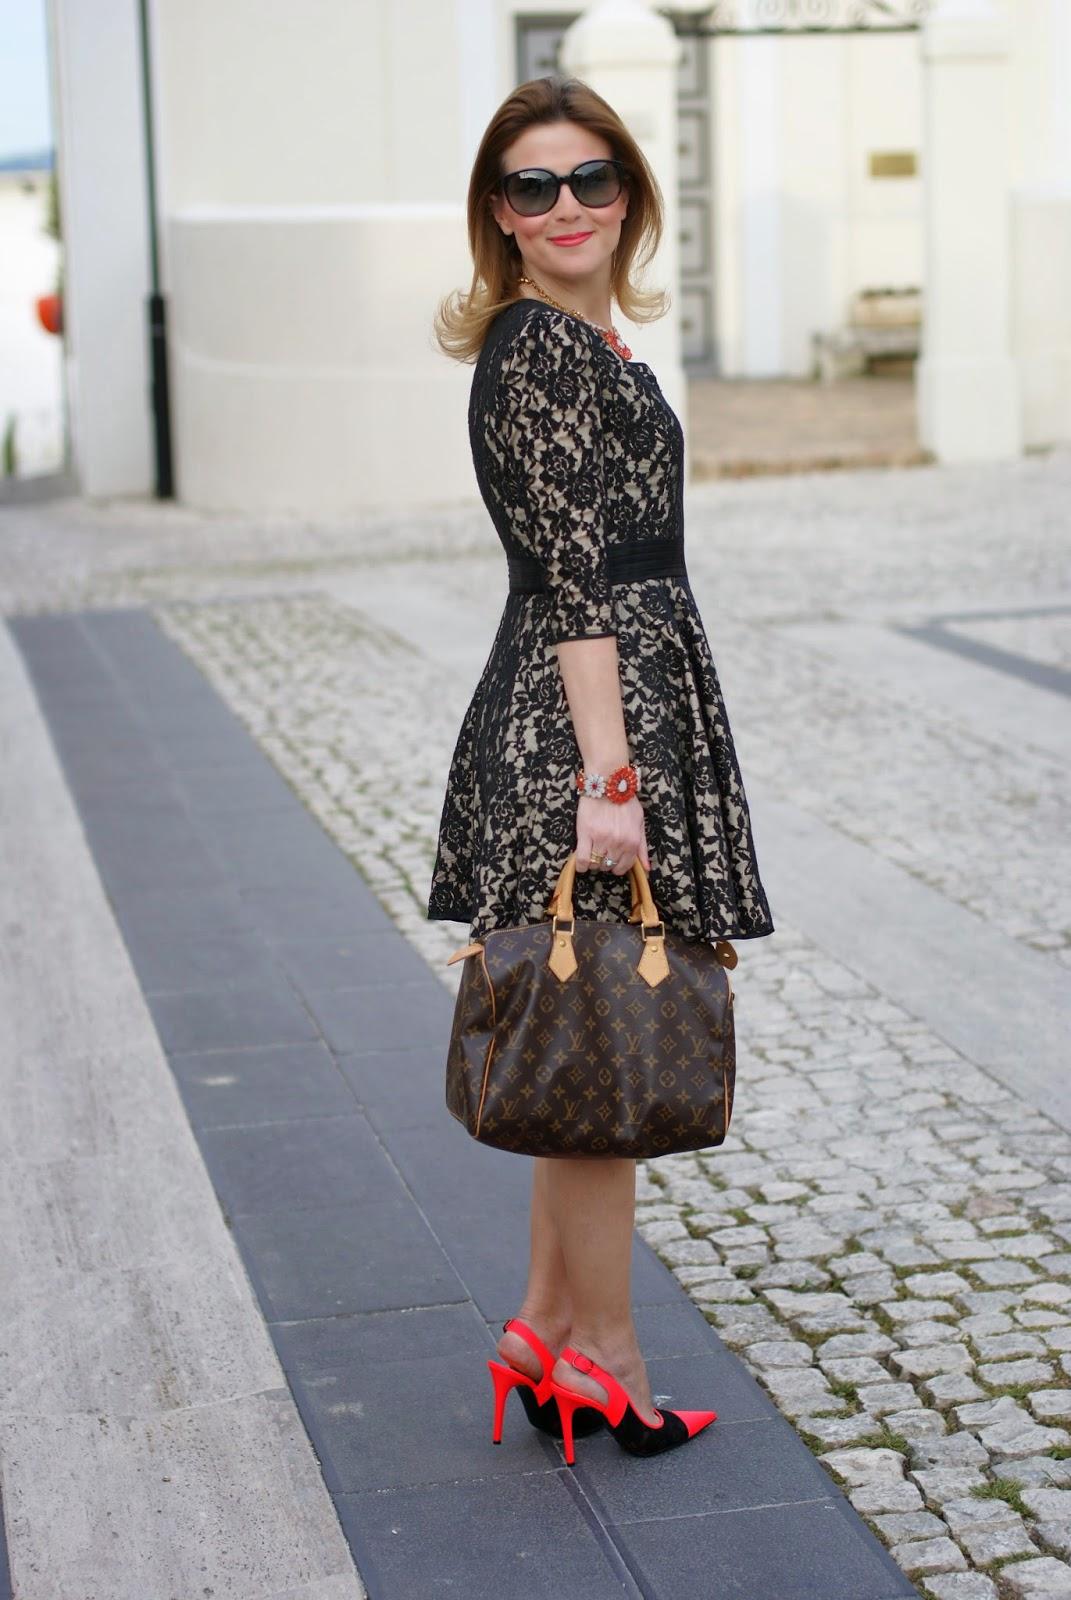 Blackfive dress, lace dress, Louis Vuitton speedy 30, Nando Muzi heels, Fashion and Cookies, fashion blogger